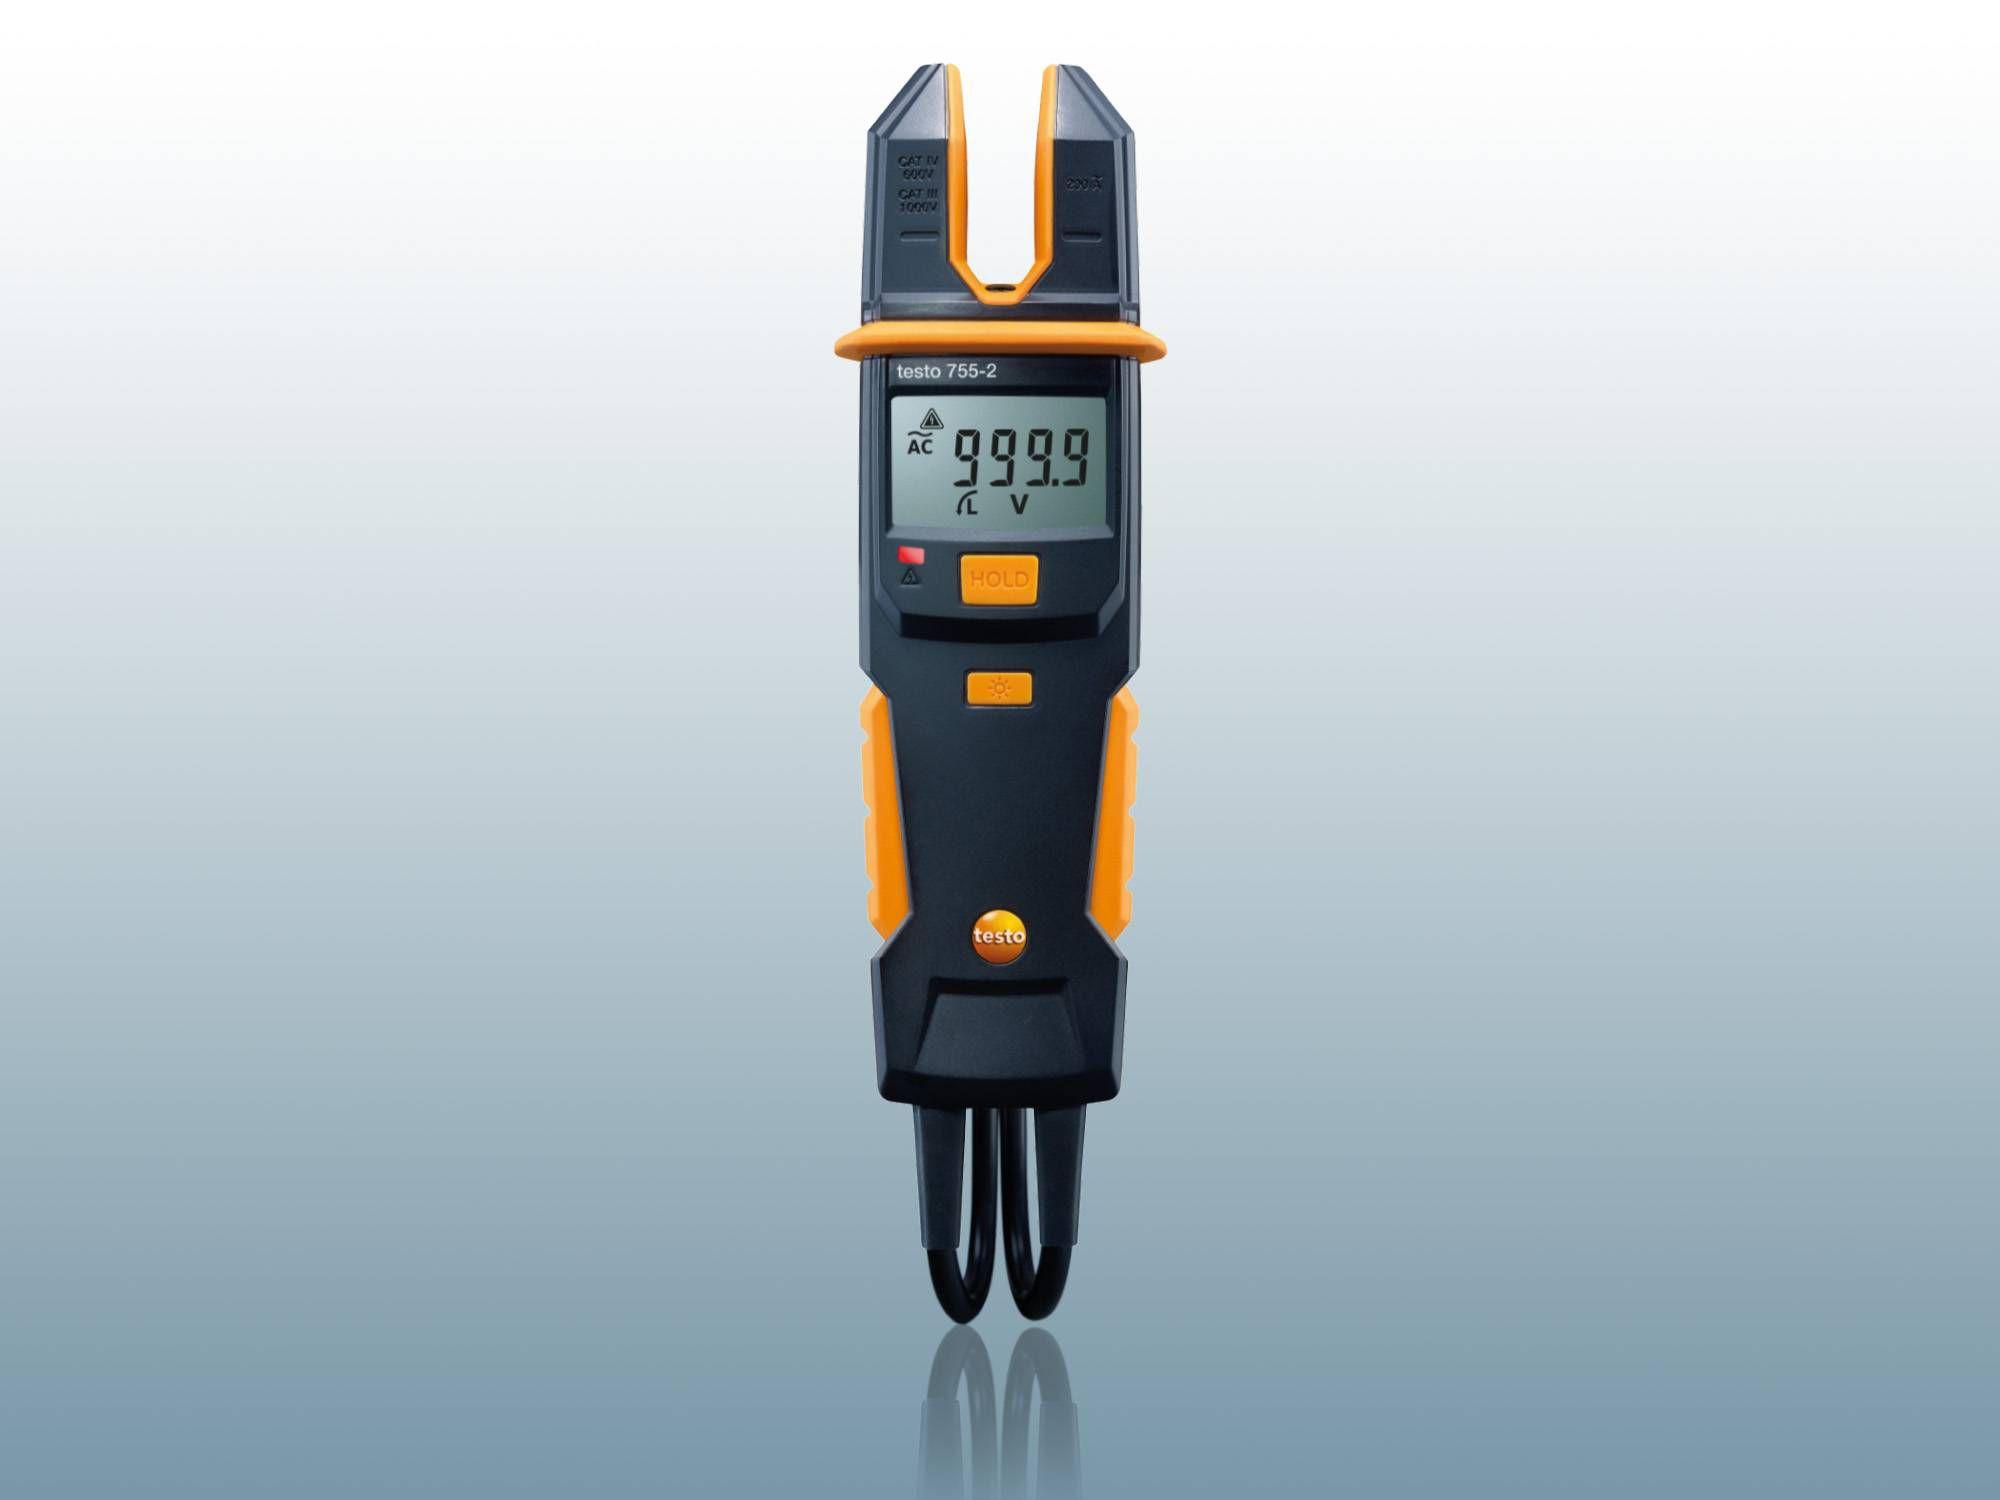 Strom-Spannungsprüfer testo 755-2